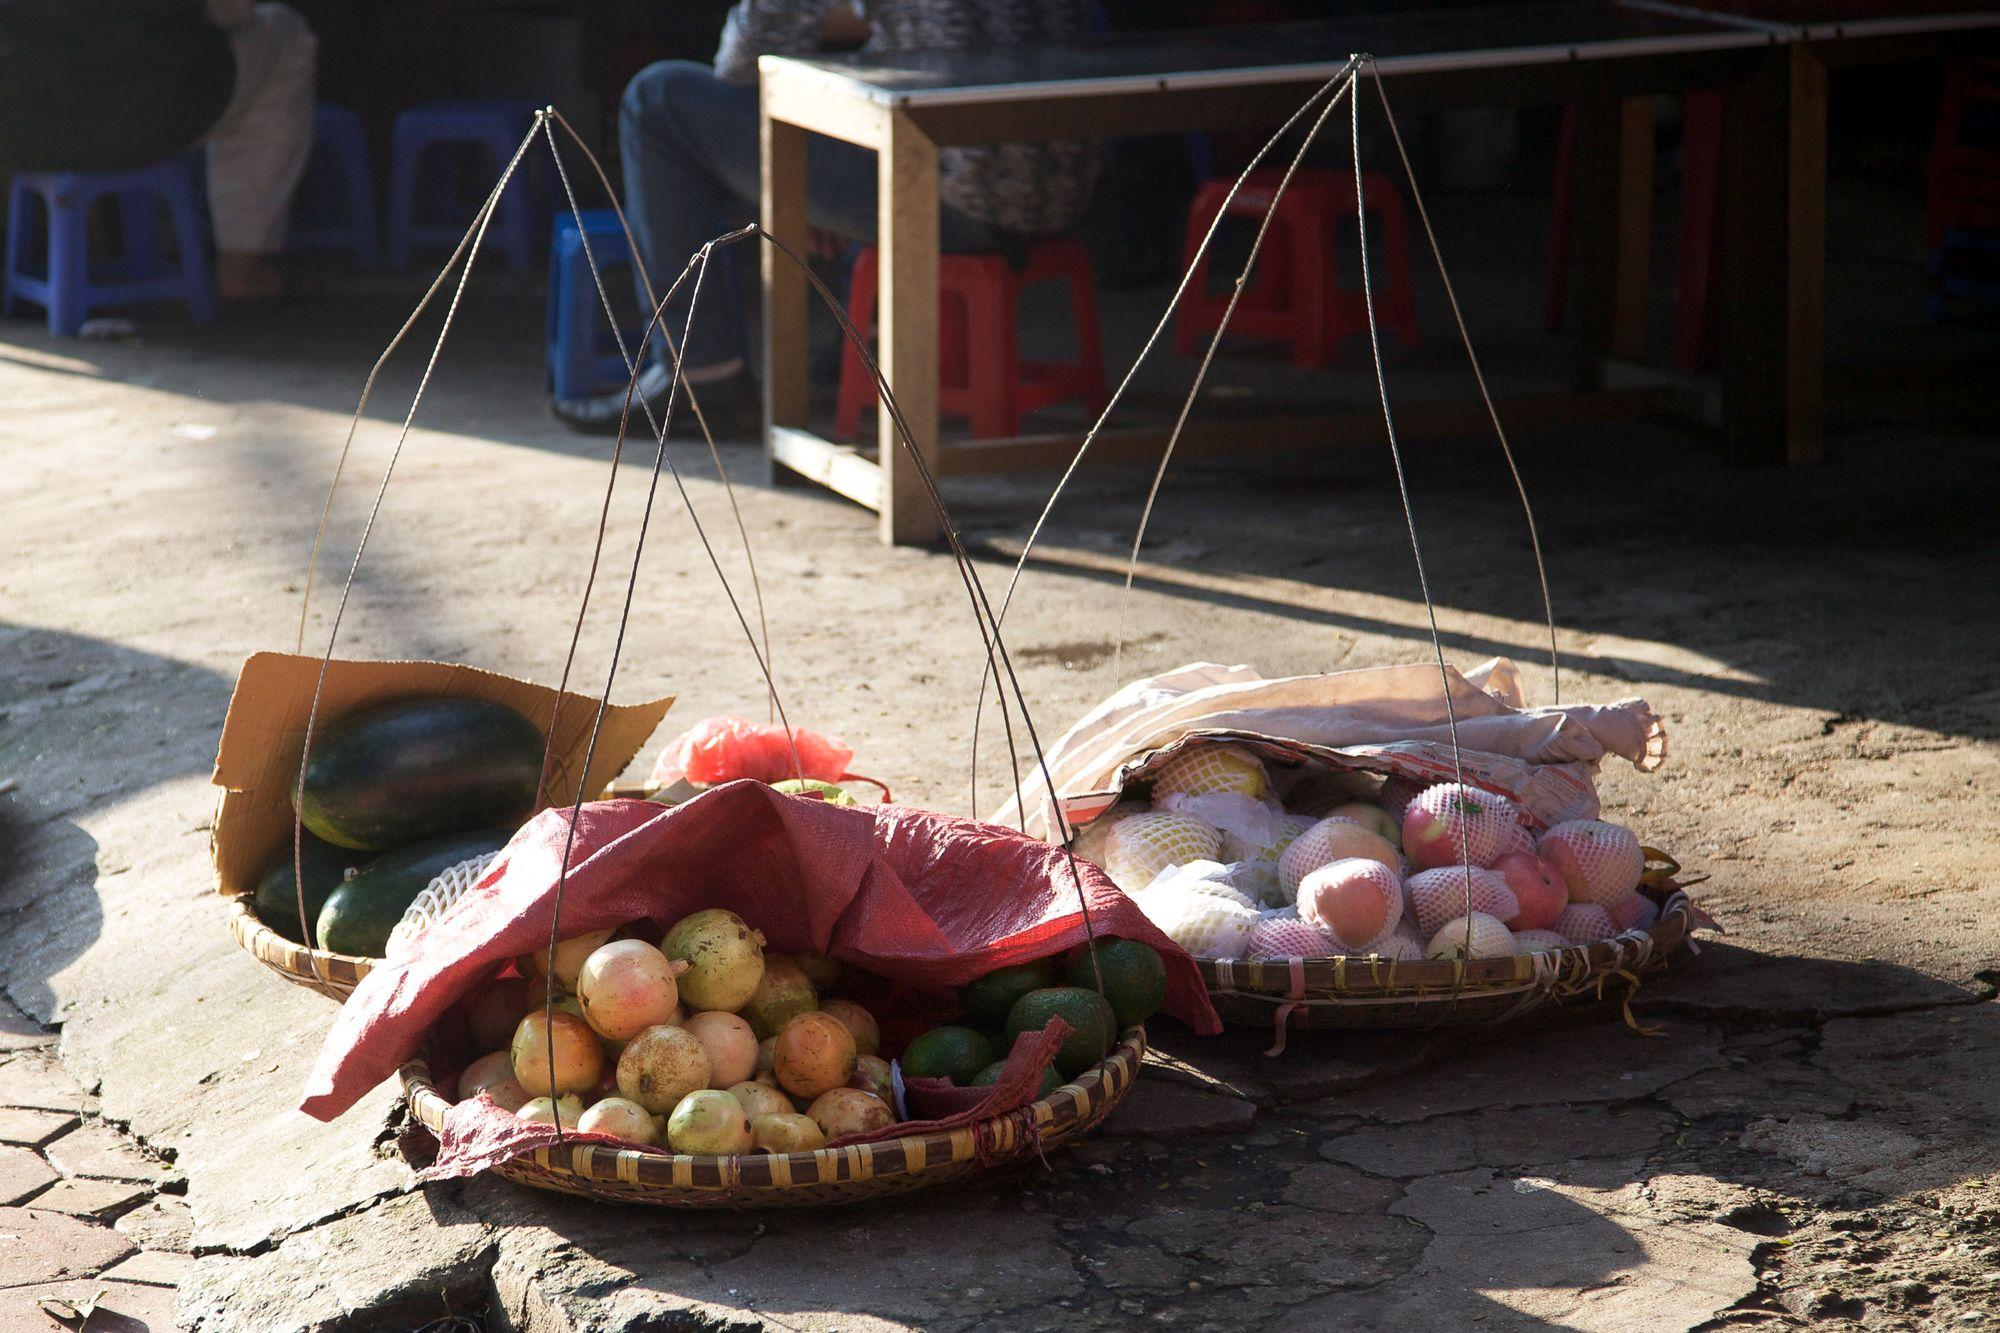 vietnam_hanoi_street_food.jpg